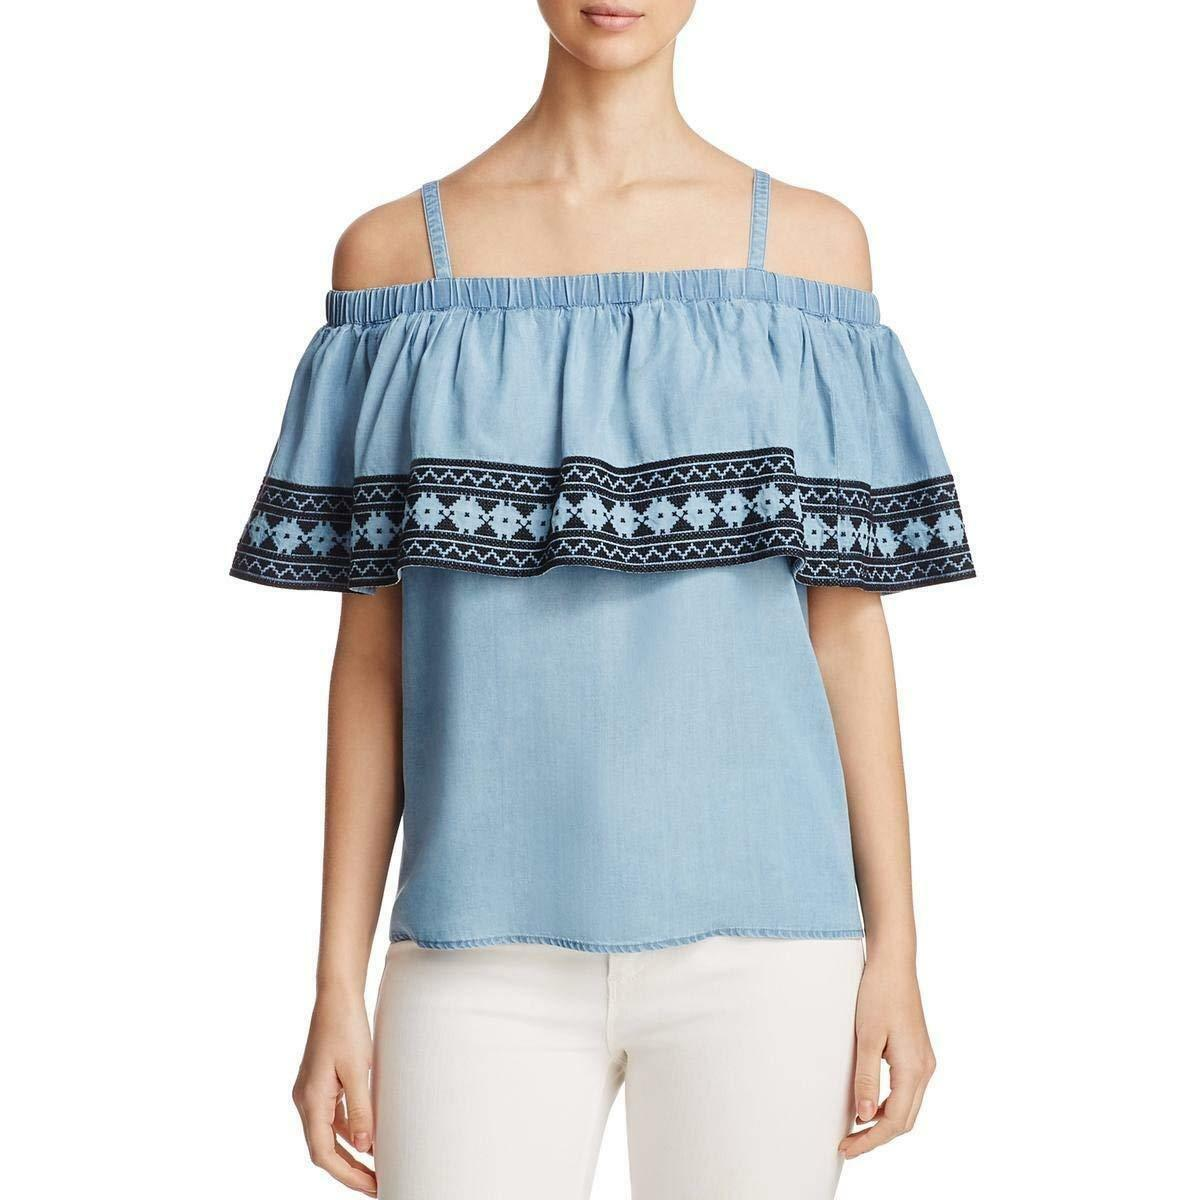 NEW Bagatelle Ruffle Cold-Shoulder Top Jean bluee Off The shoulder Blouse DENIM